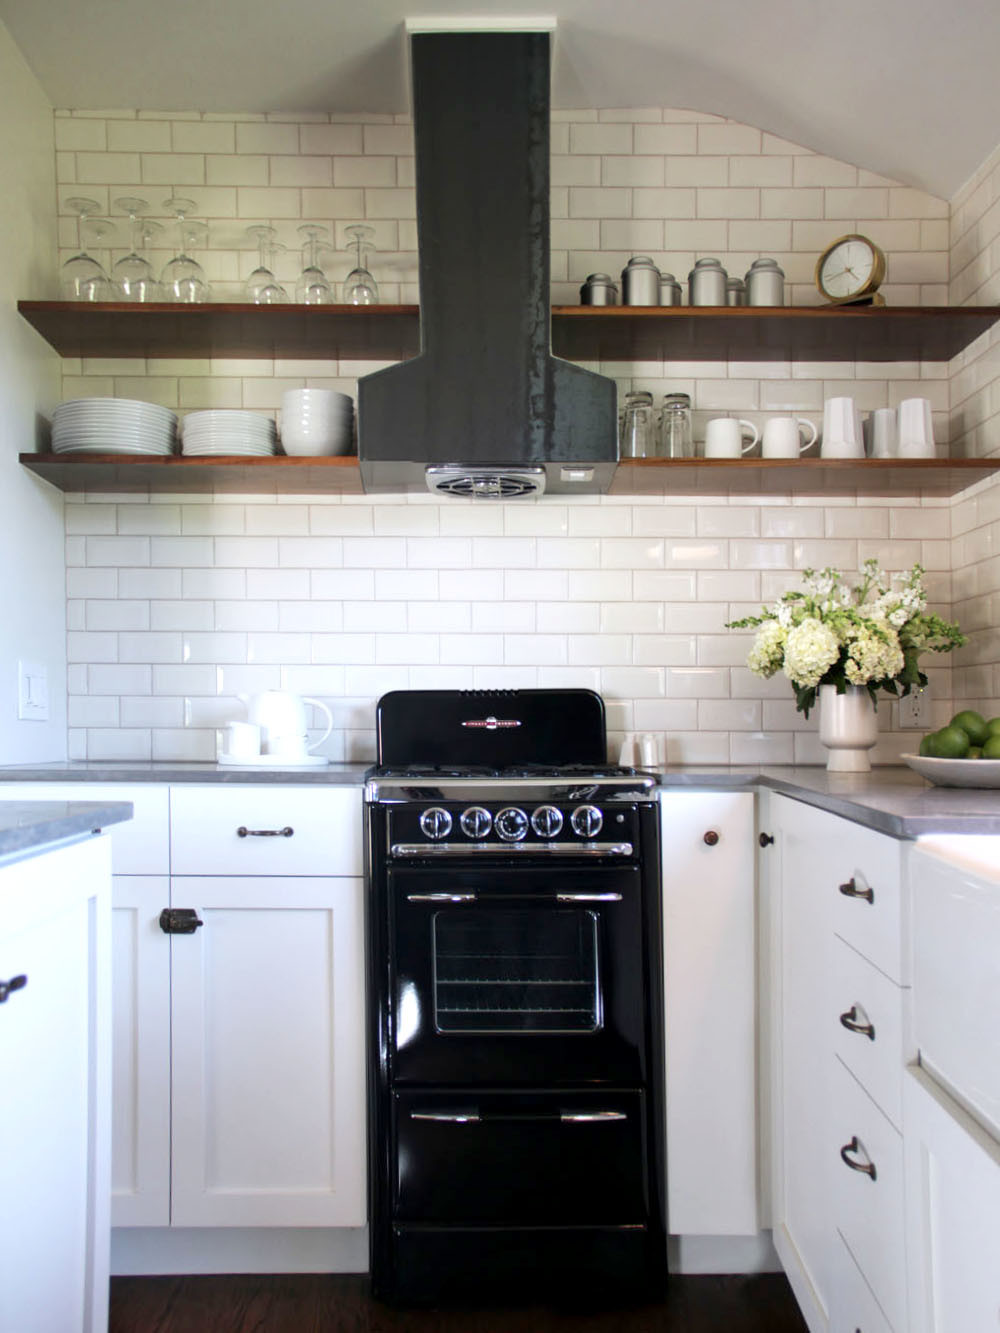 Small appliances subway tile kitchenette